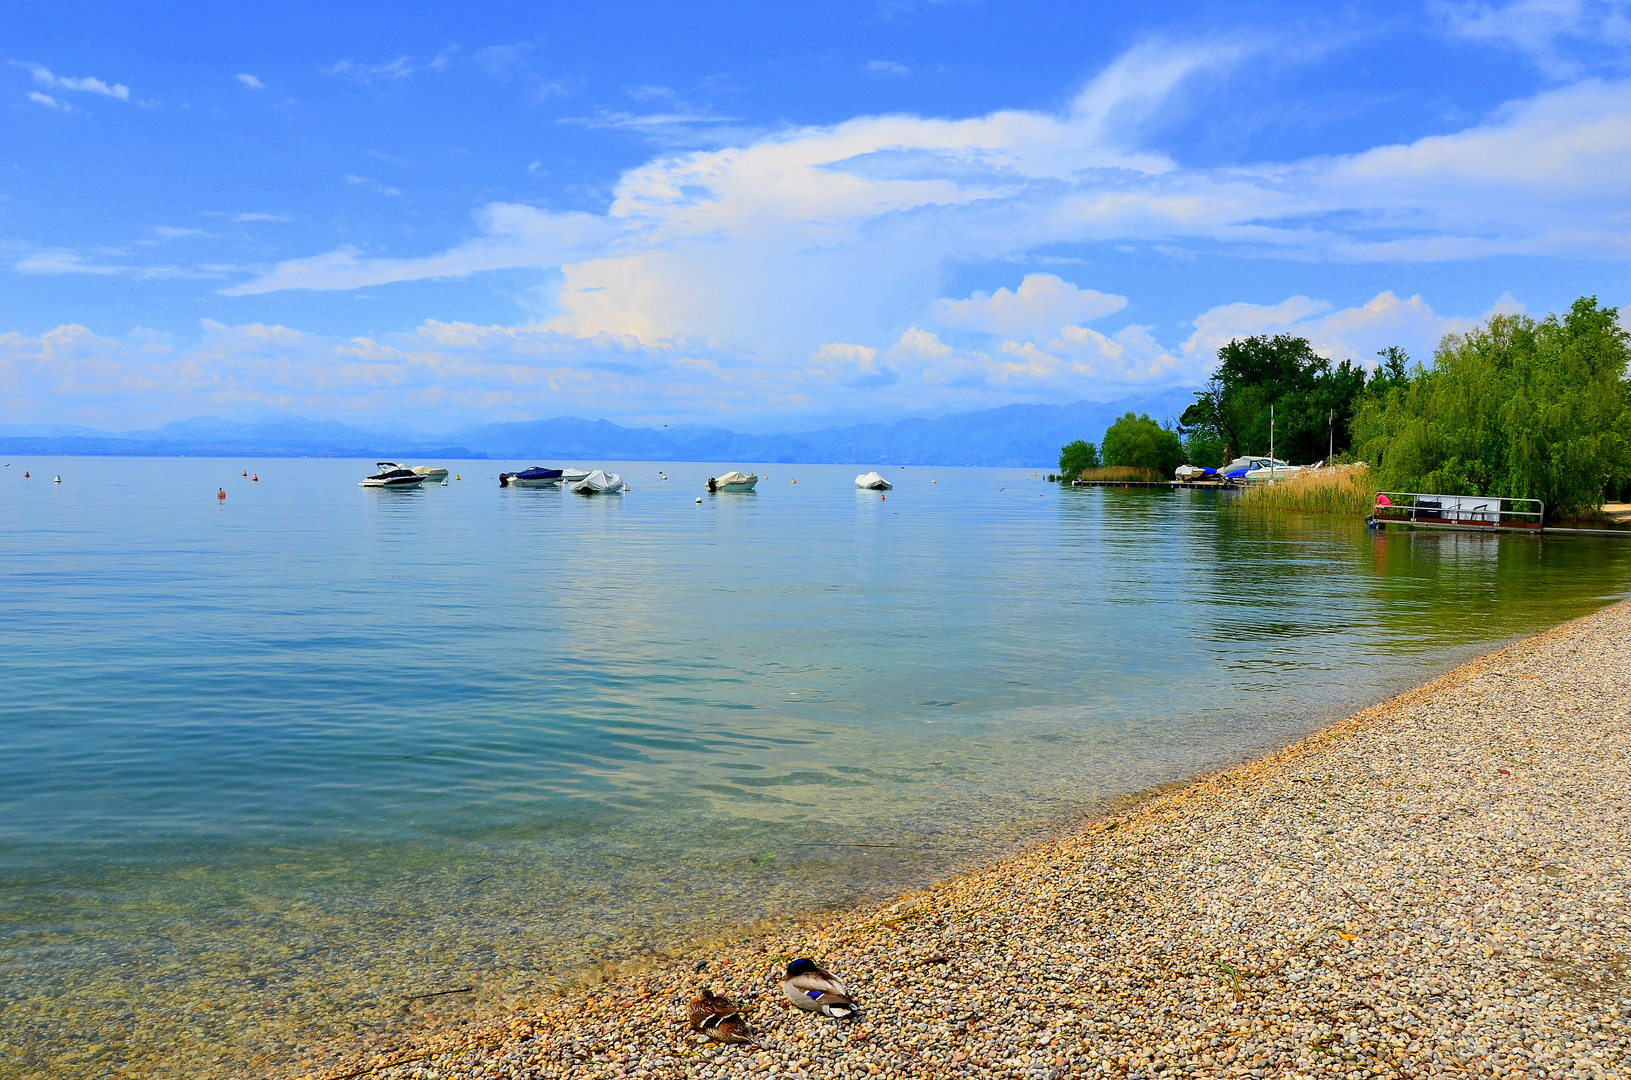 Lake Garda, near Lazise - Spring 2014